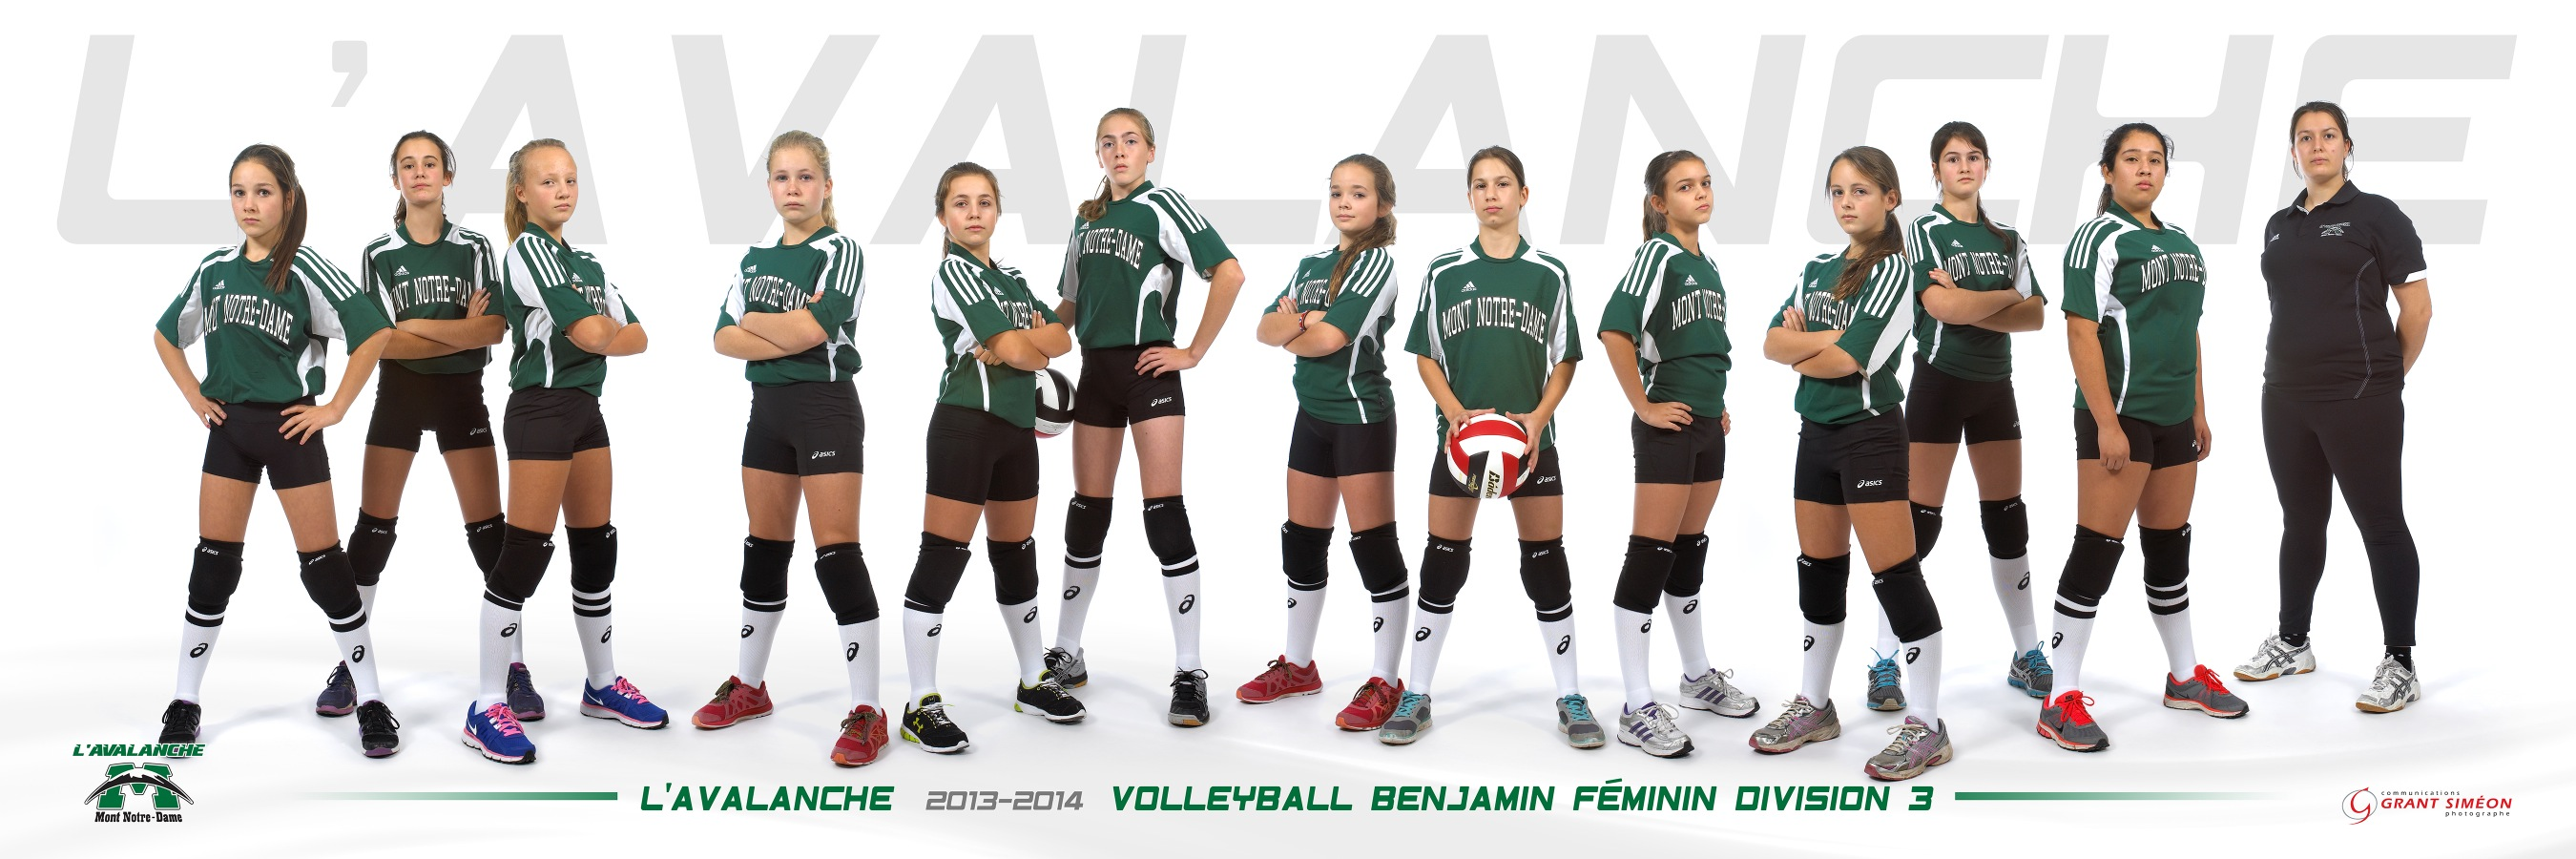 cmnd_volleyball-benj-div-3-2013-2014-amelie